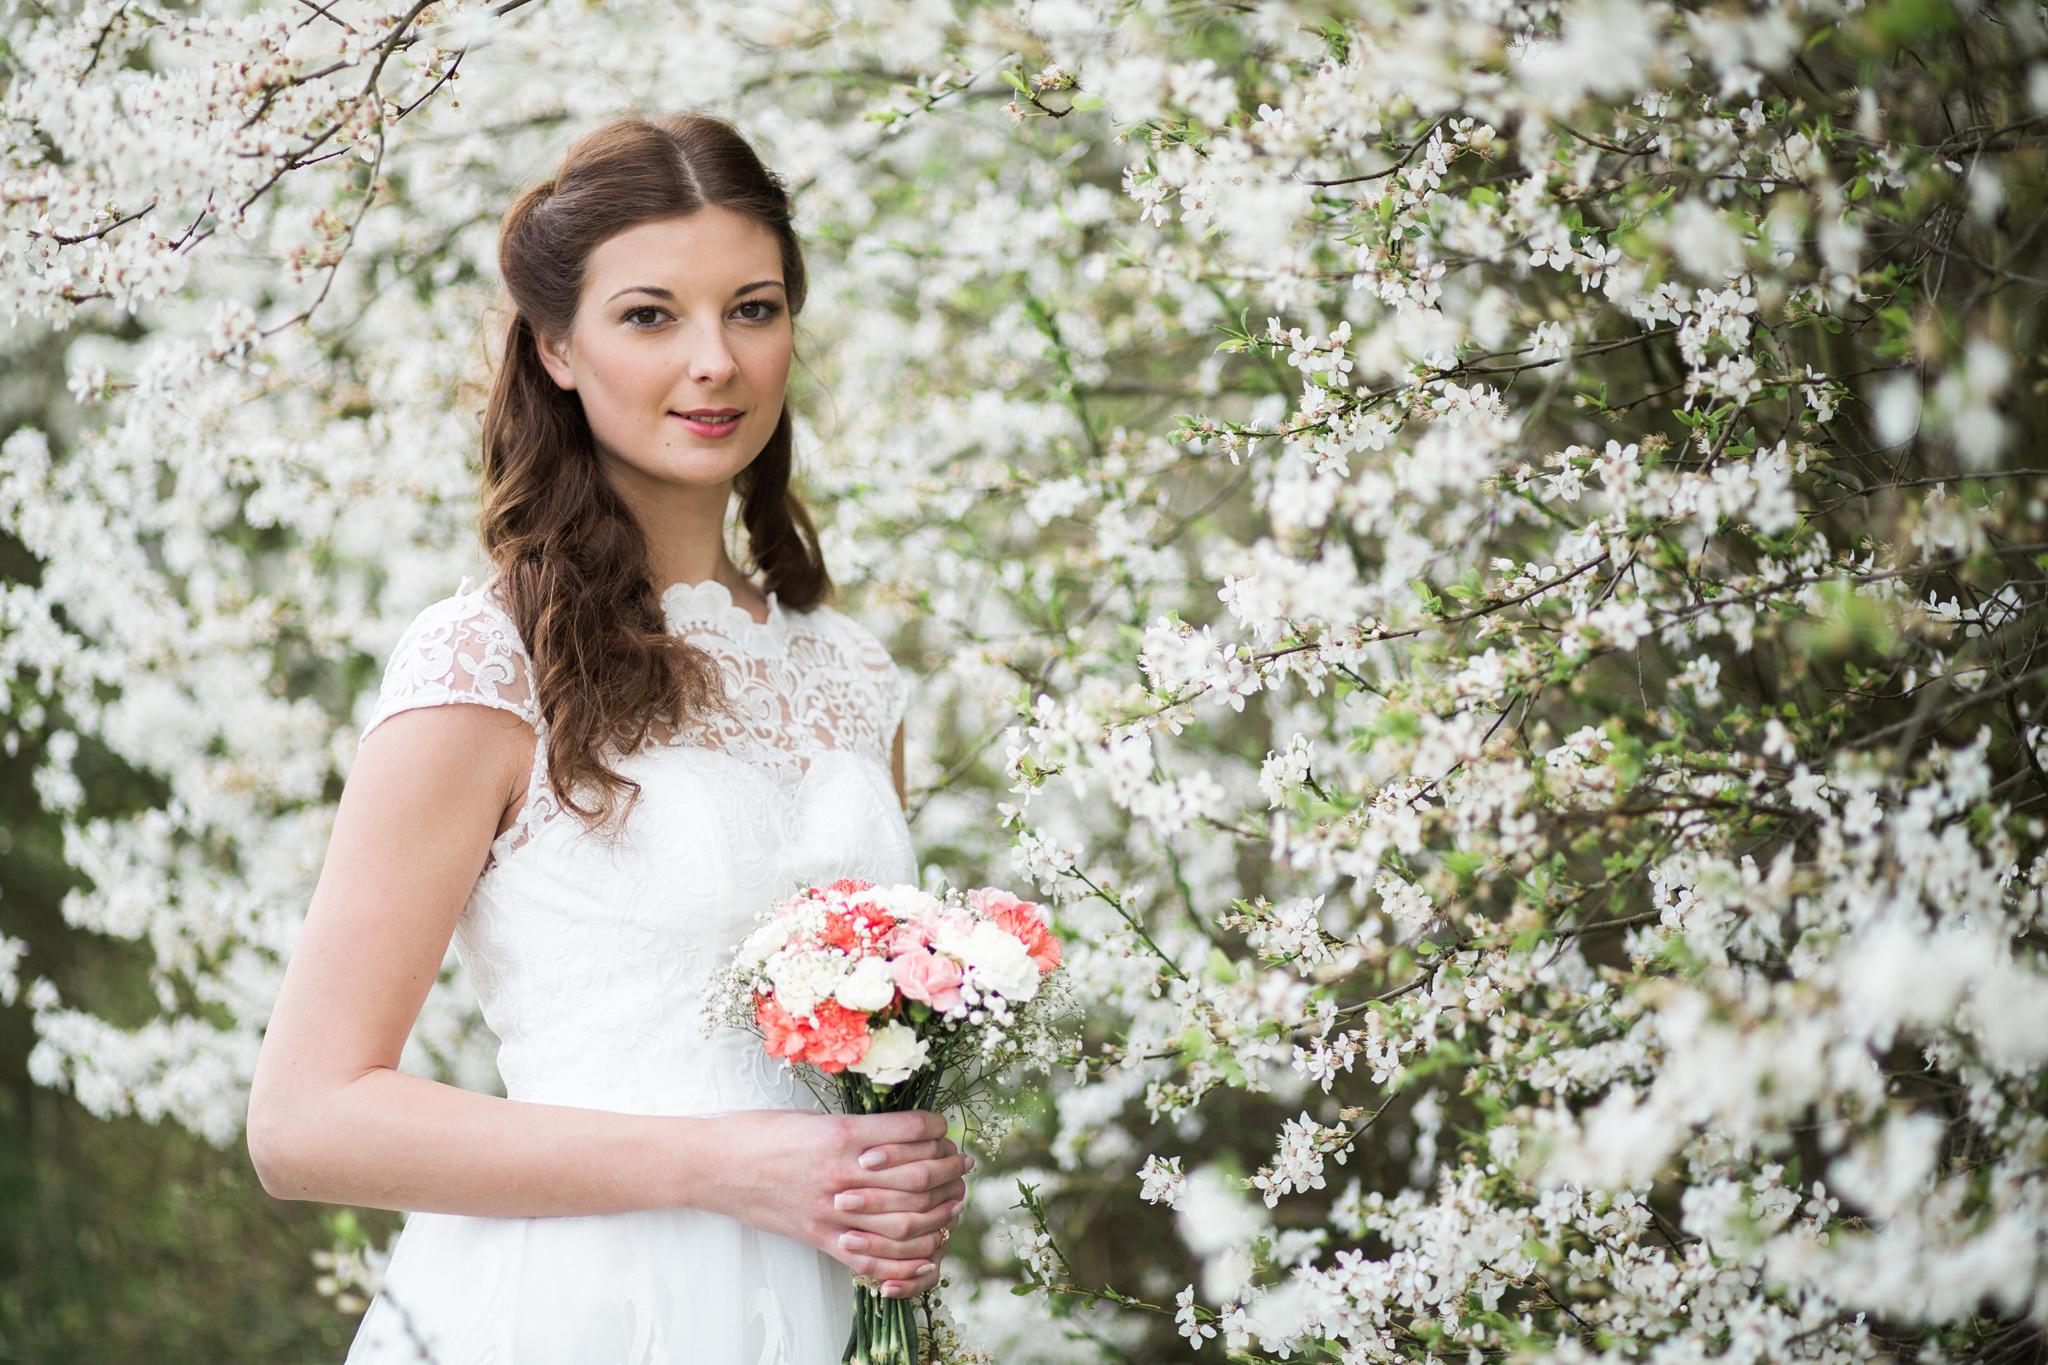 styled-wedding-bridal-shoot-blossom-15